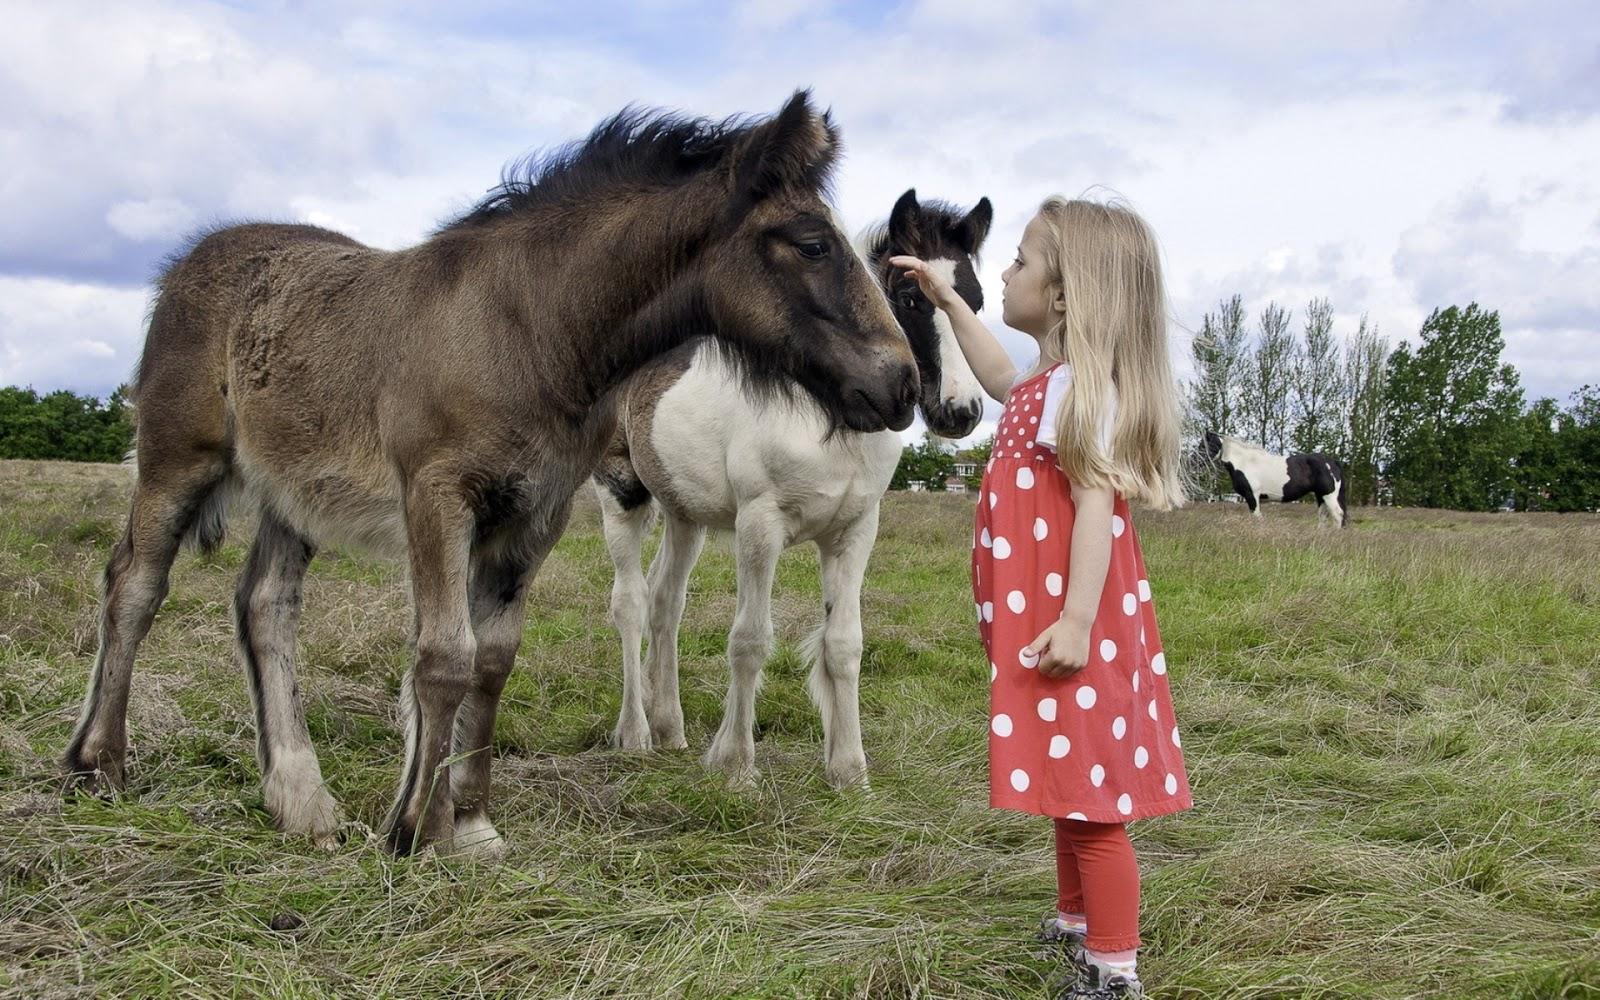 http://2.bp.blogspot.com/-VDymwrX_2NA/UVz-SJ-fJGI/AAAAAAAAZG0/xWEHYyln5cQ/s1600/a-horses-on-the-meadow.jpg